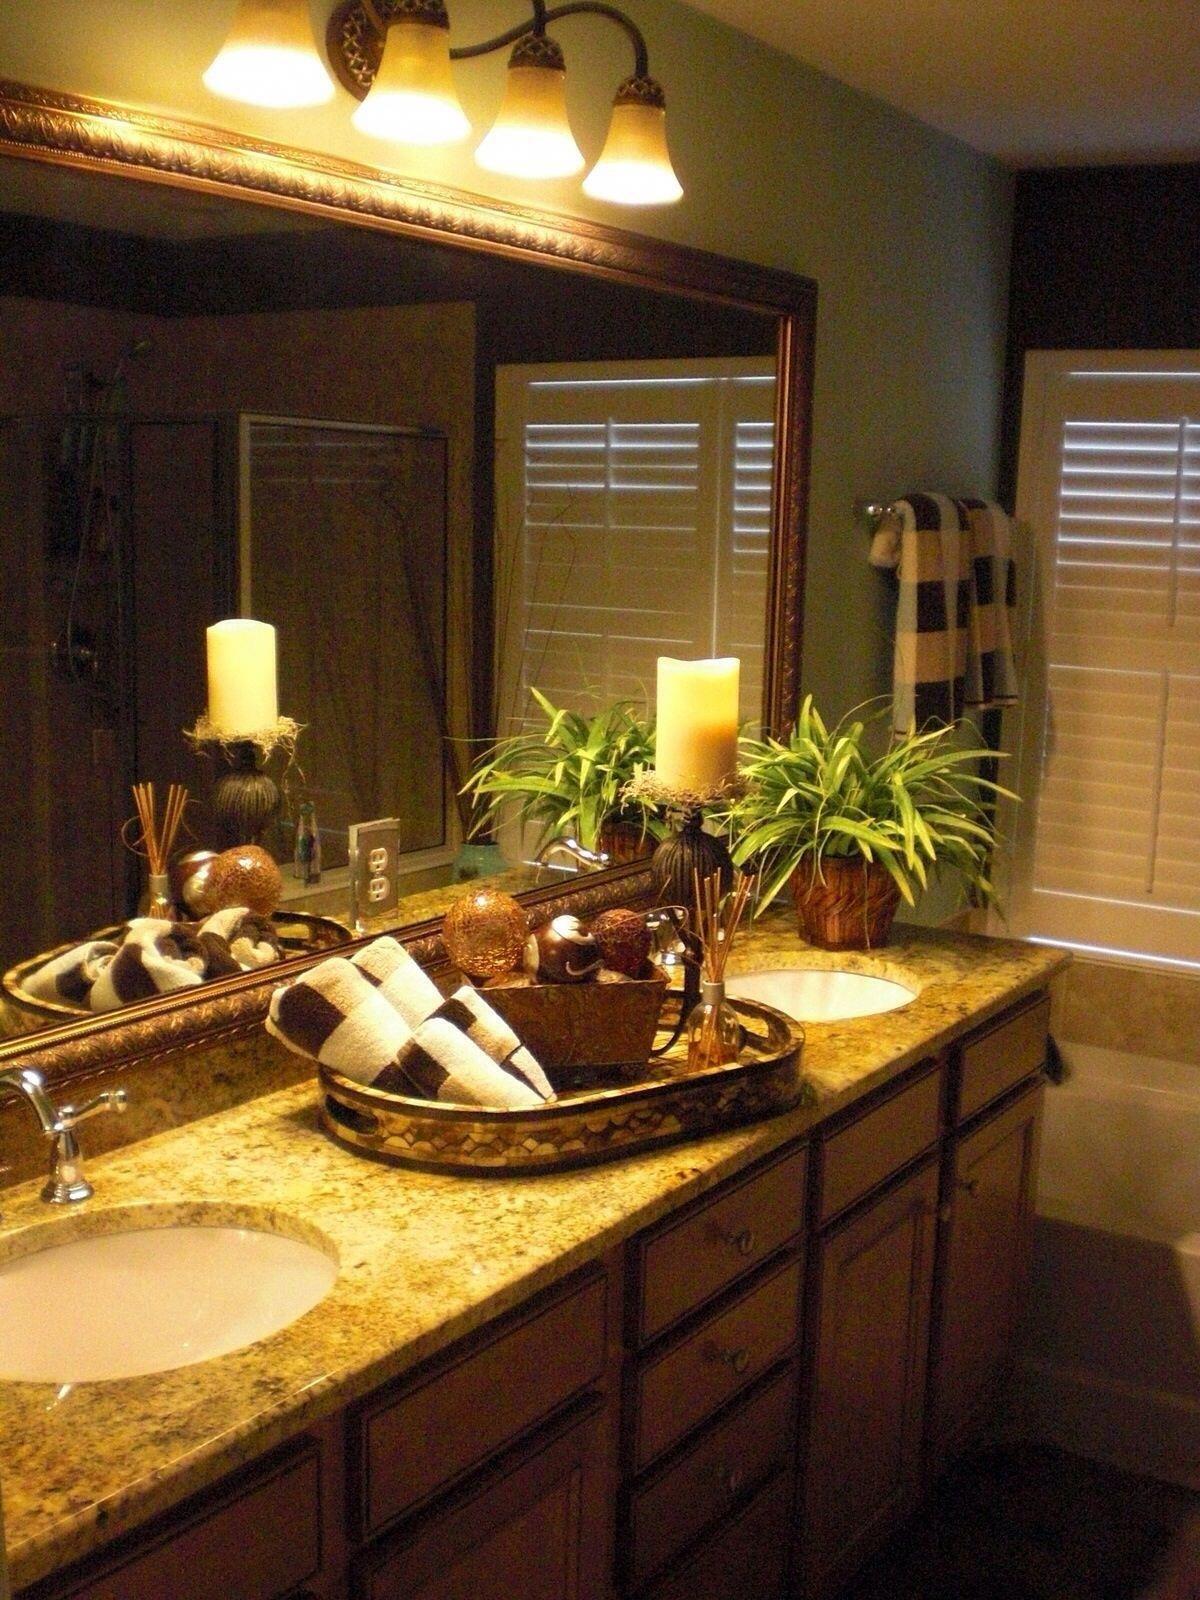 Home Goods Bathroom Storage